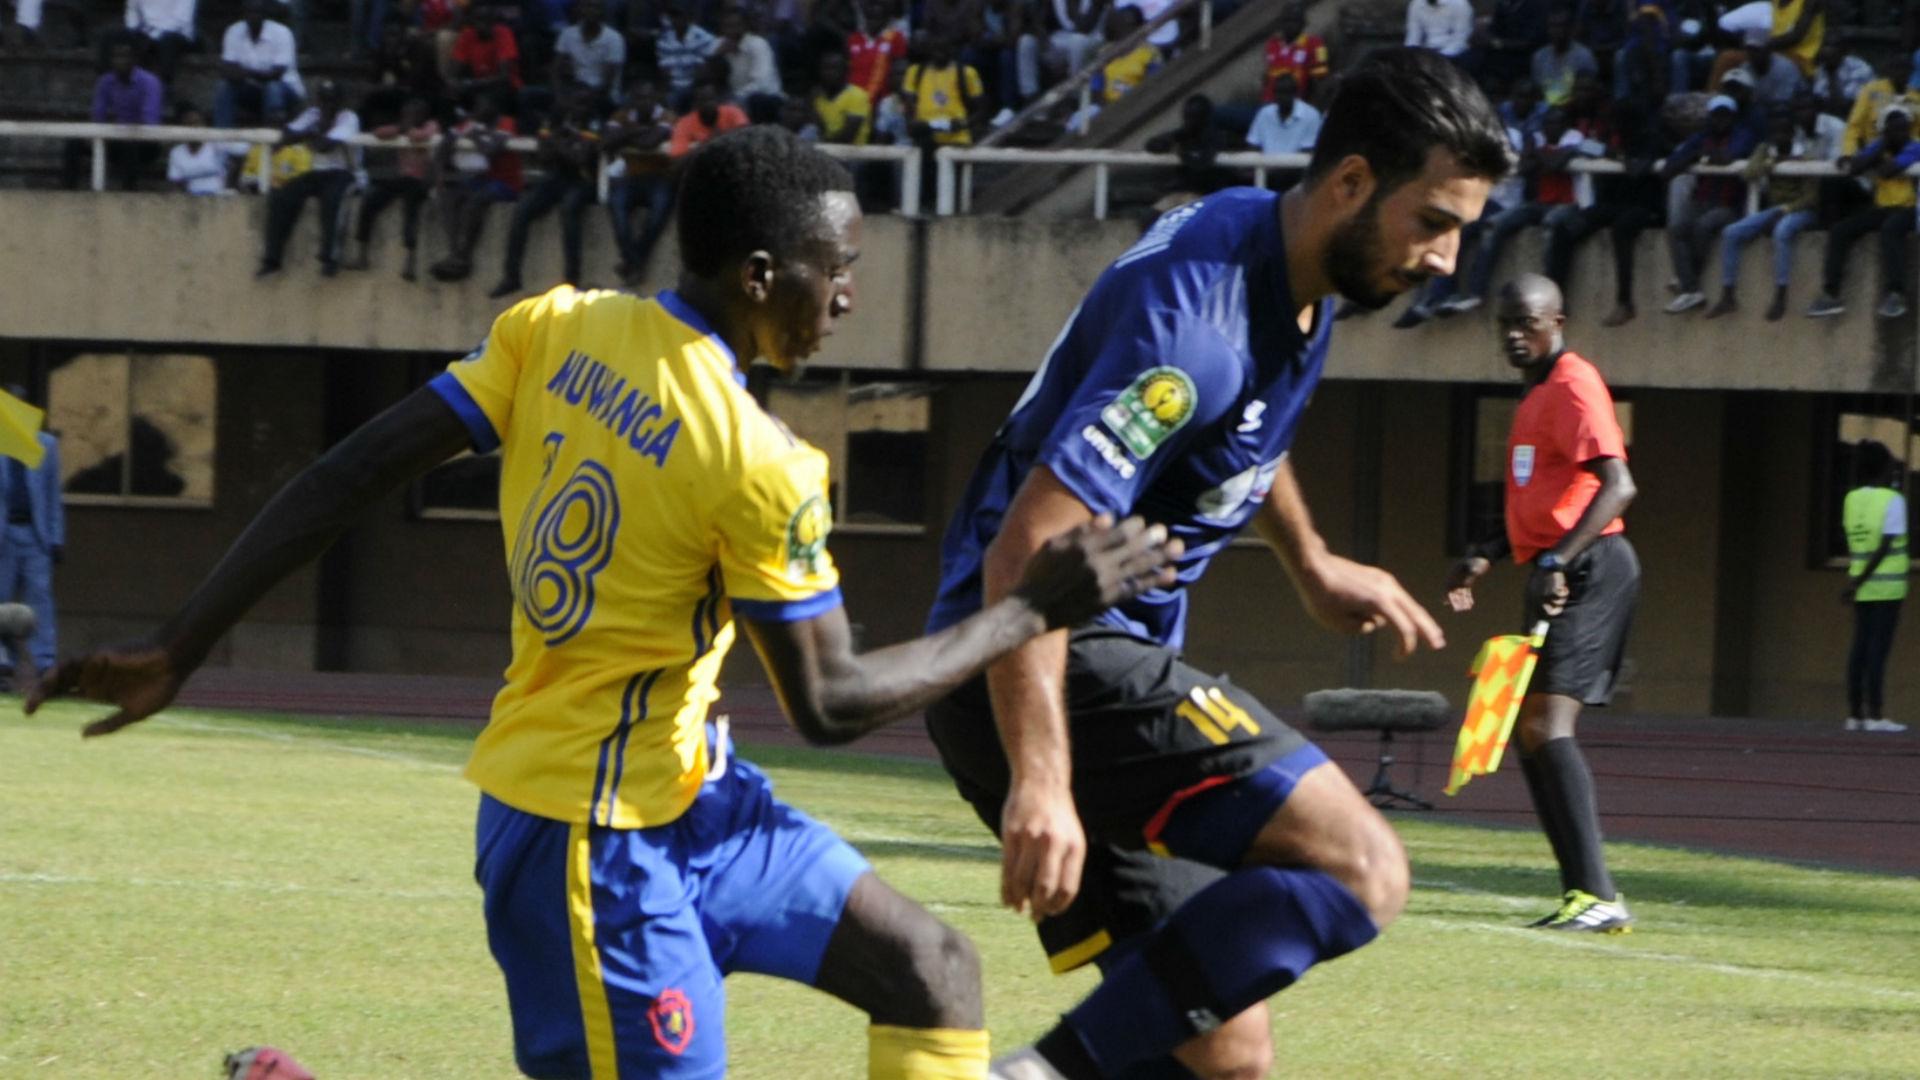 Haythem Jouini (R) of Esperance Sportive de Tunis (EST) and Bernard Muwanga (L) of Kampala Capital City Authority FC (KCCA), July 2018